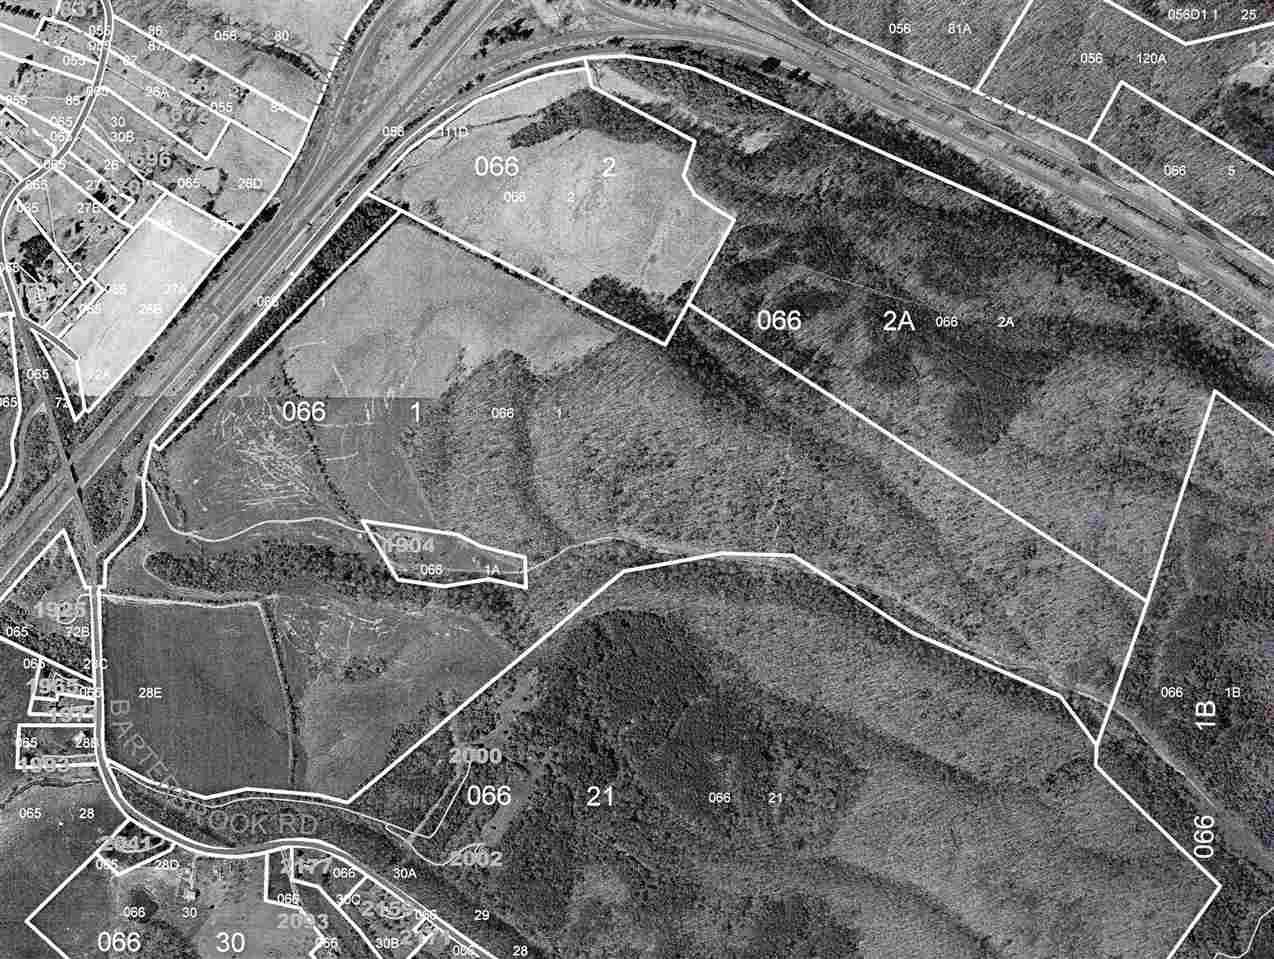 TBD Barterbrook Rd, Staunton, VA, 24401